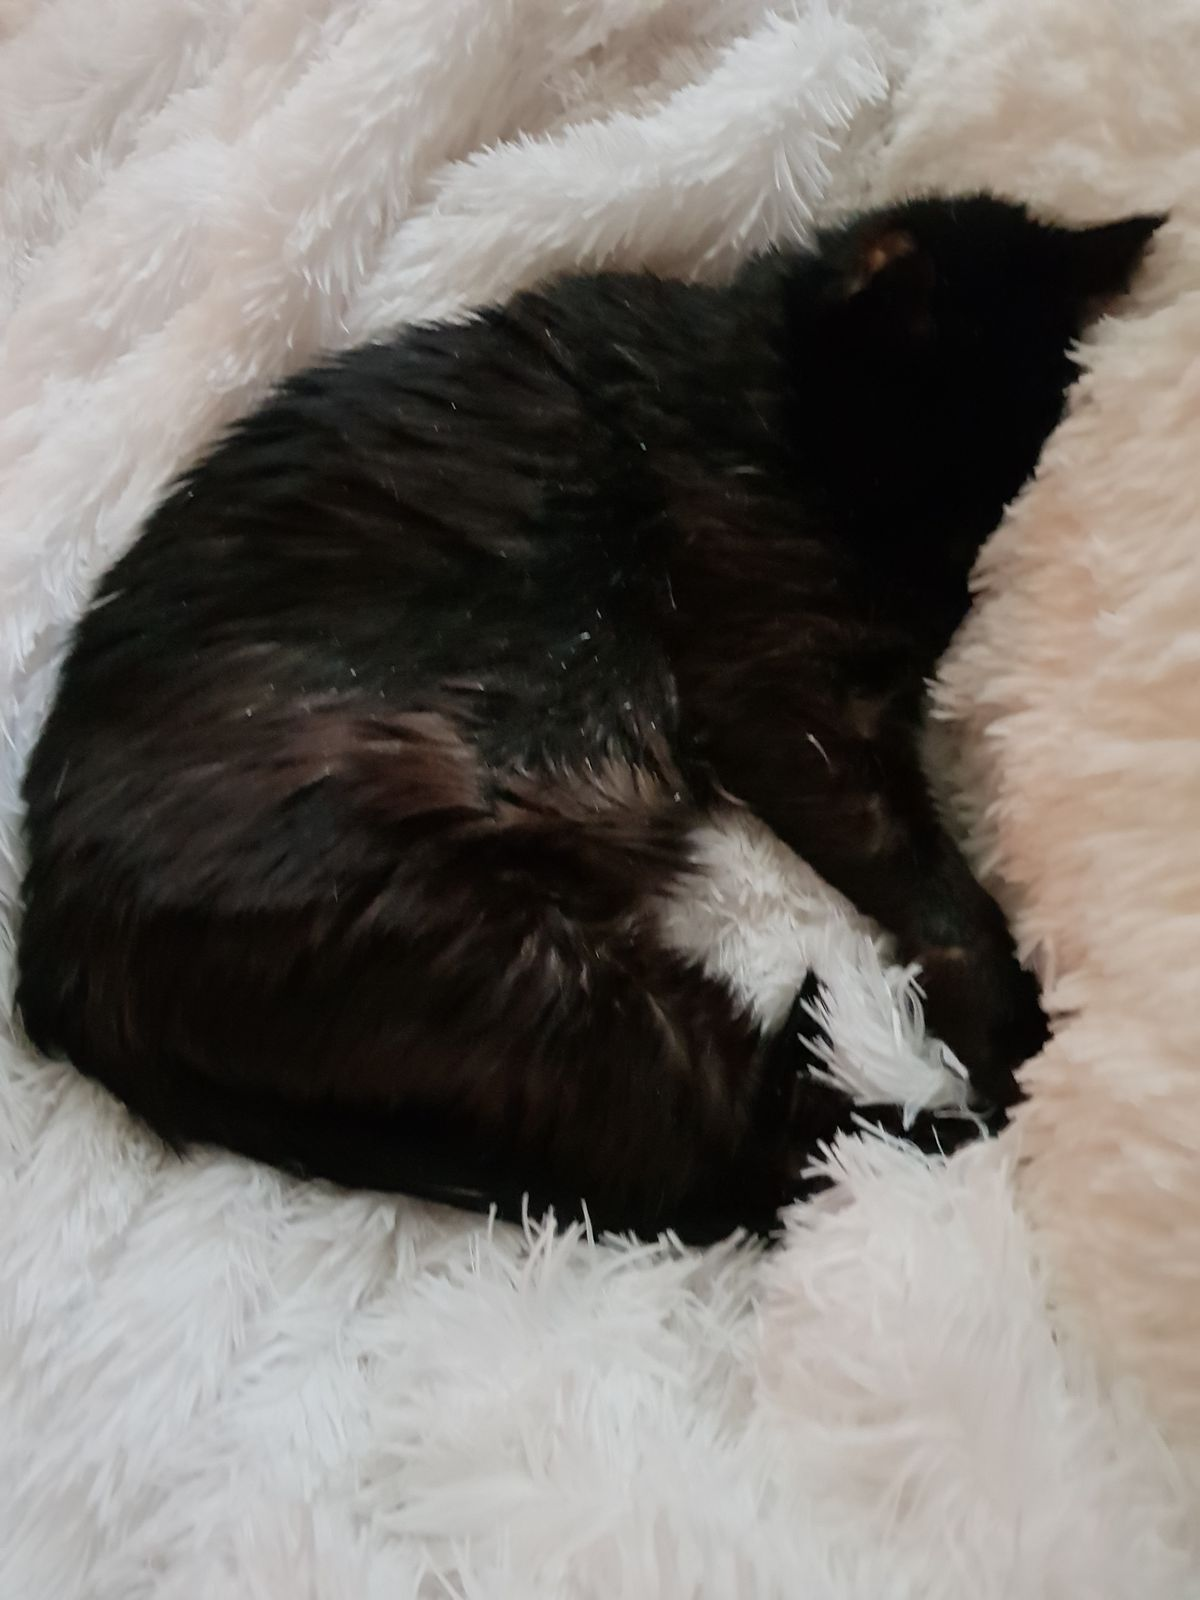 My Precious beloved fur daughter in her senior year of 15